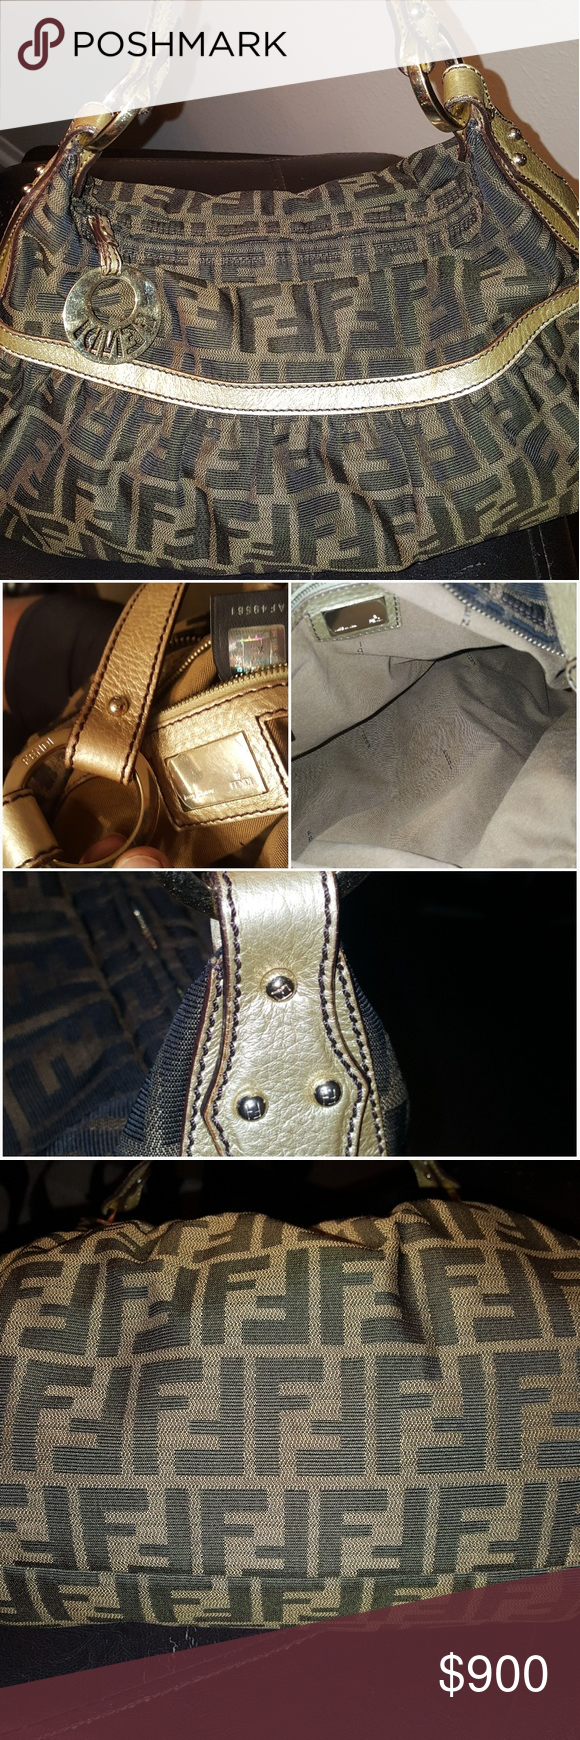 ... new zealand genuine fendi zucca hobo bag like new fendi plate still has  protection film. ... 0f6535b7c5